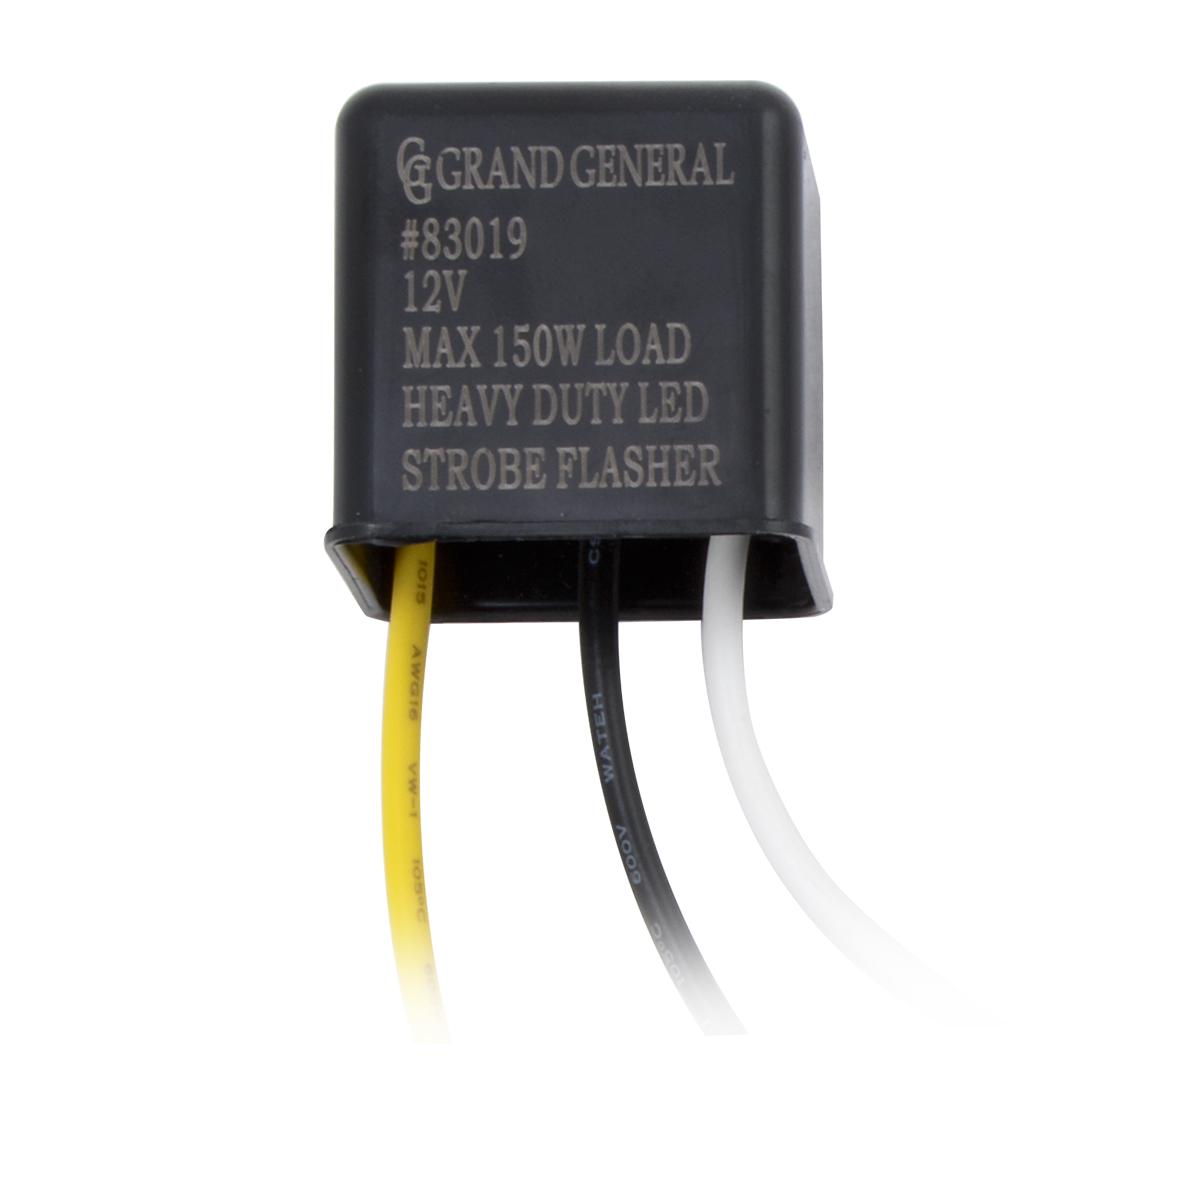 Heavy Duty Led Strobe Flasher Grand General Auto Parts Light Circuit Using Transistors 83019